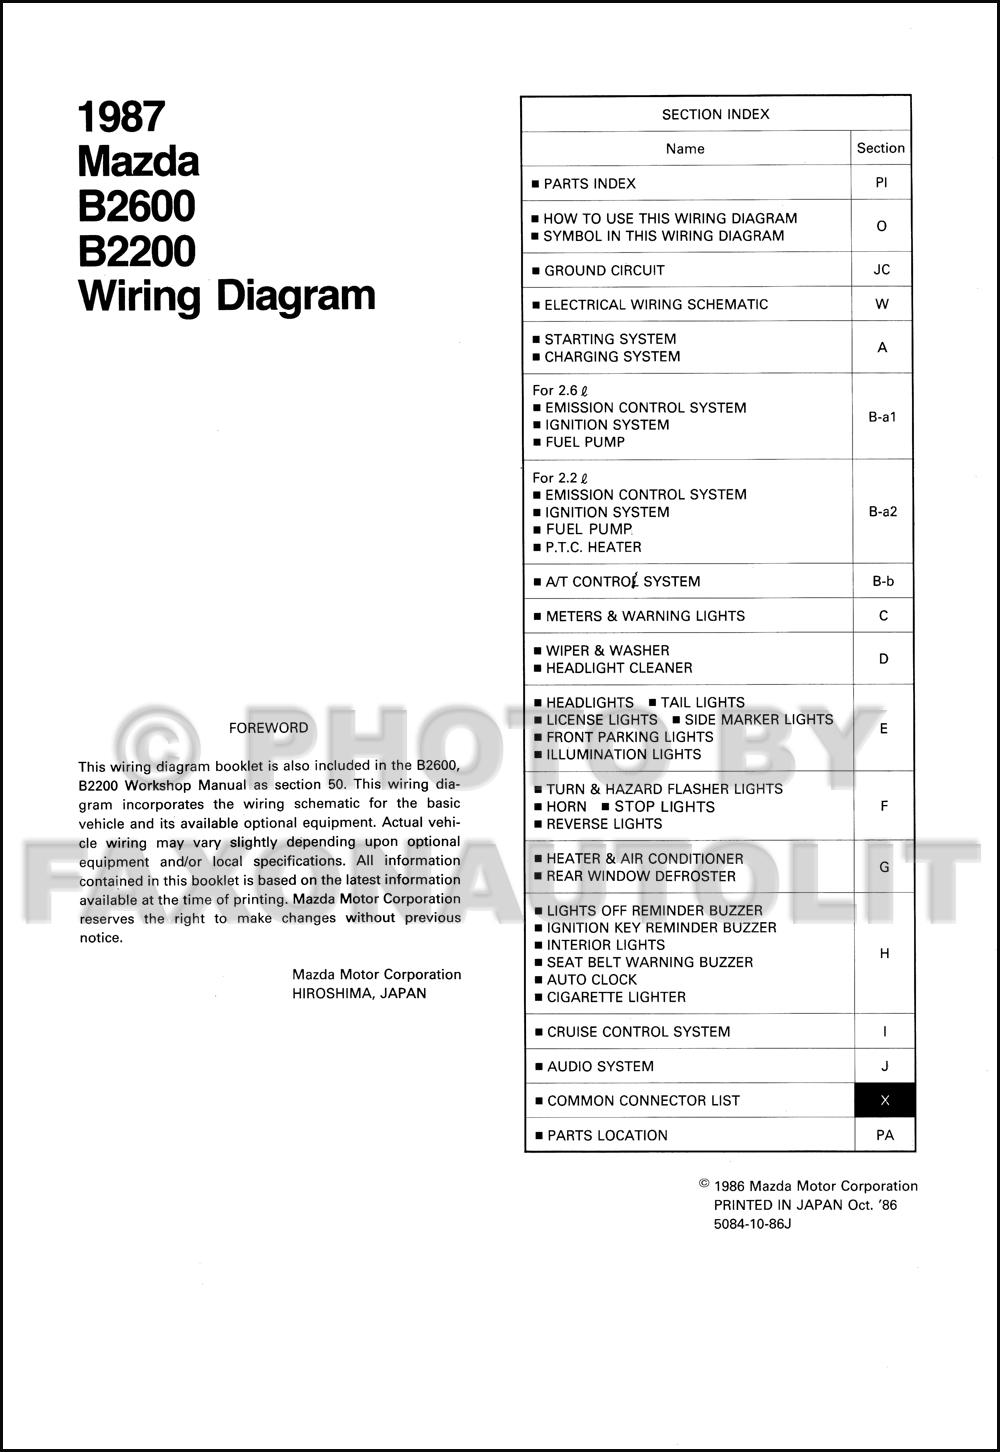 1987 Mazda B2200 Wiring Diagram